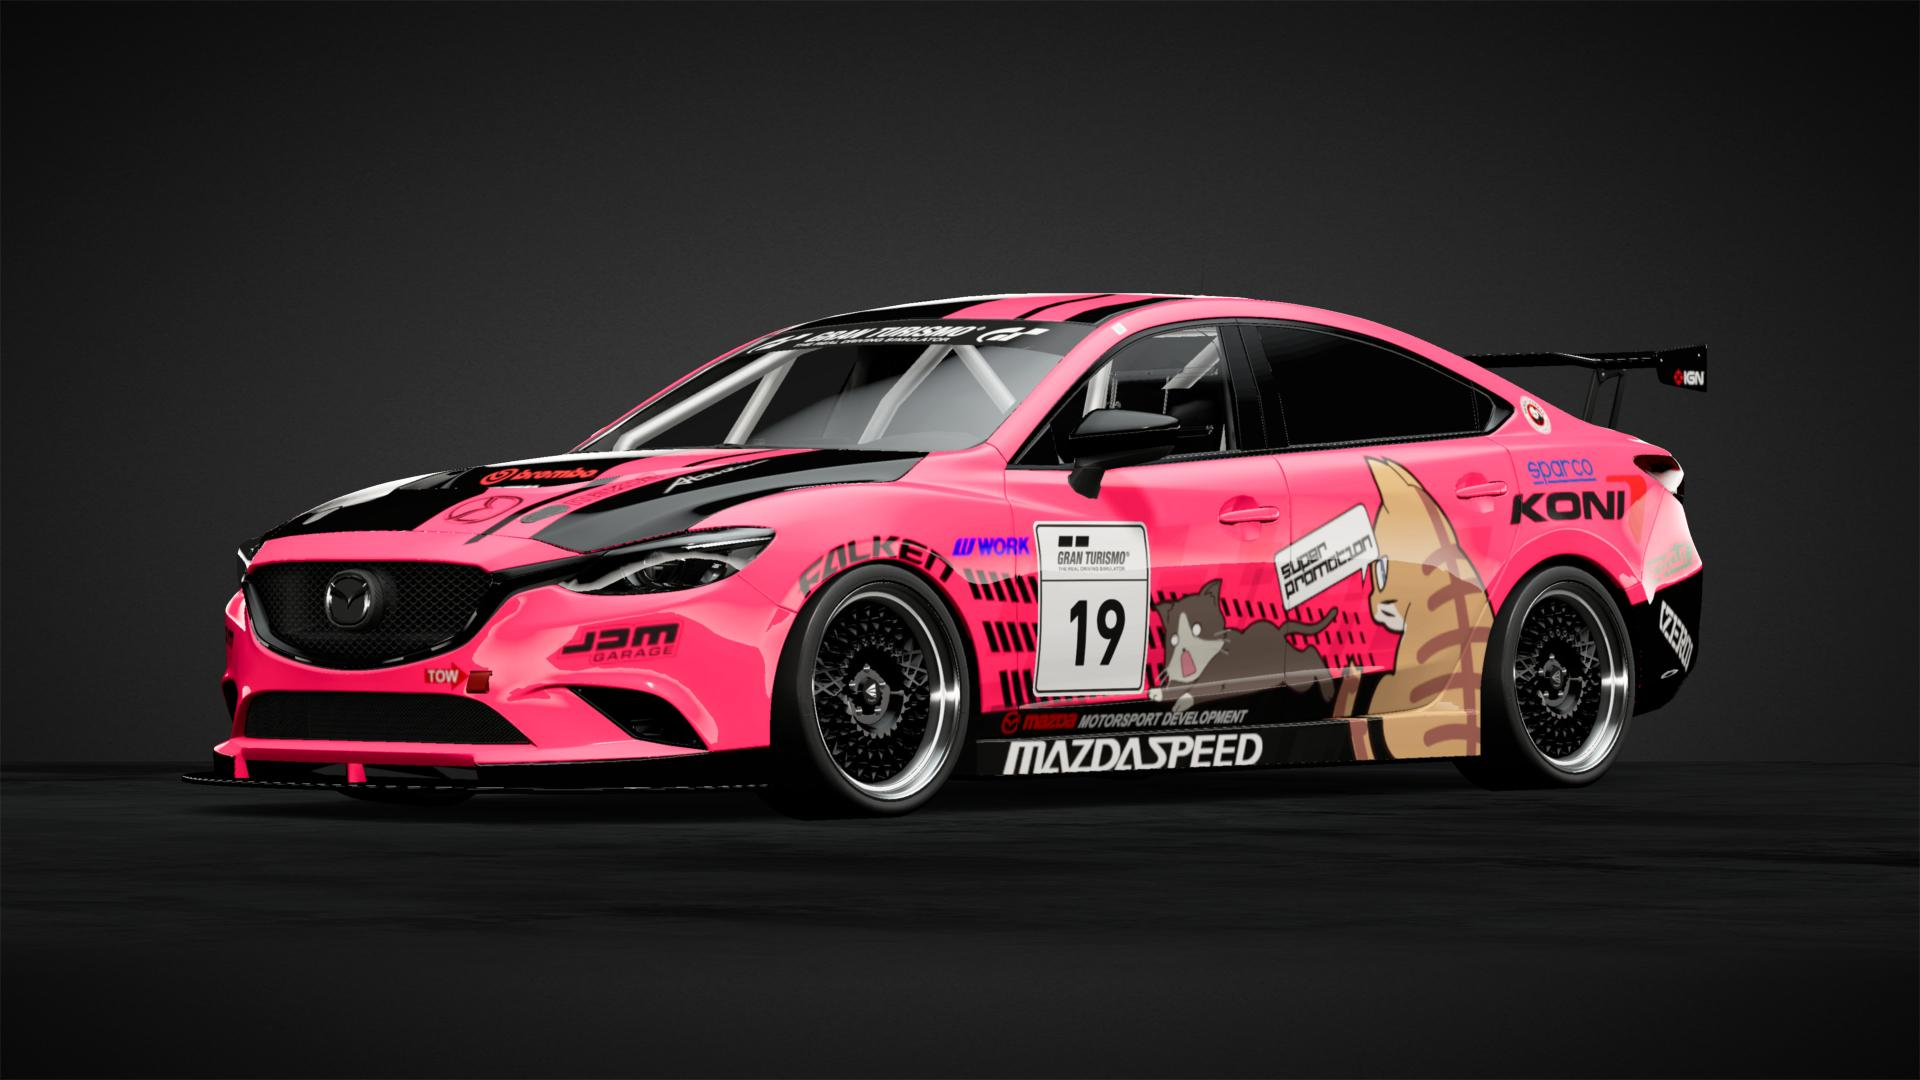 Mazda Jdm Street Racing Livery Car Livery By Musical Artist Community Gran Turismo Sport